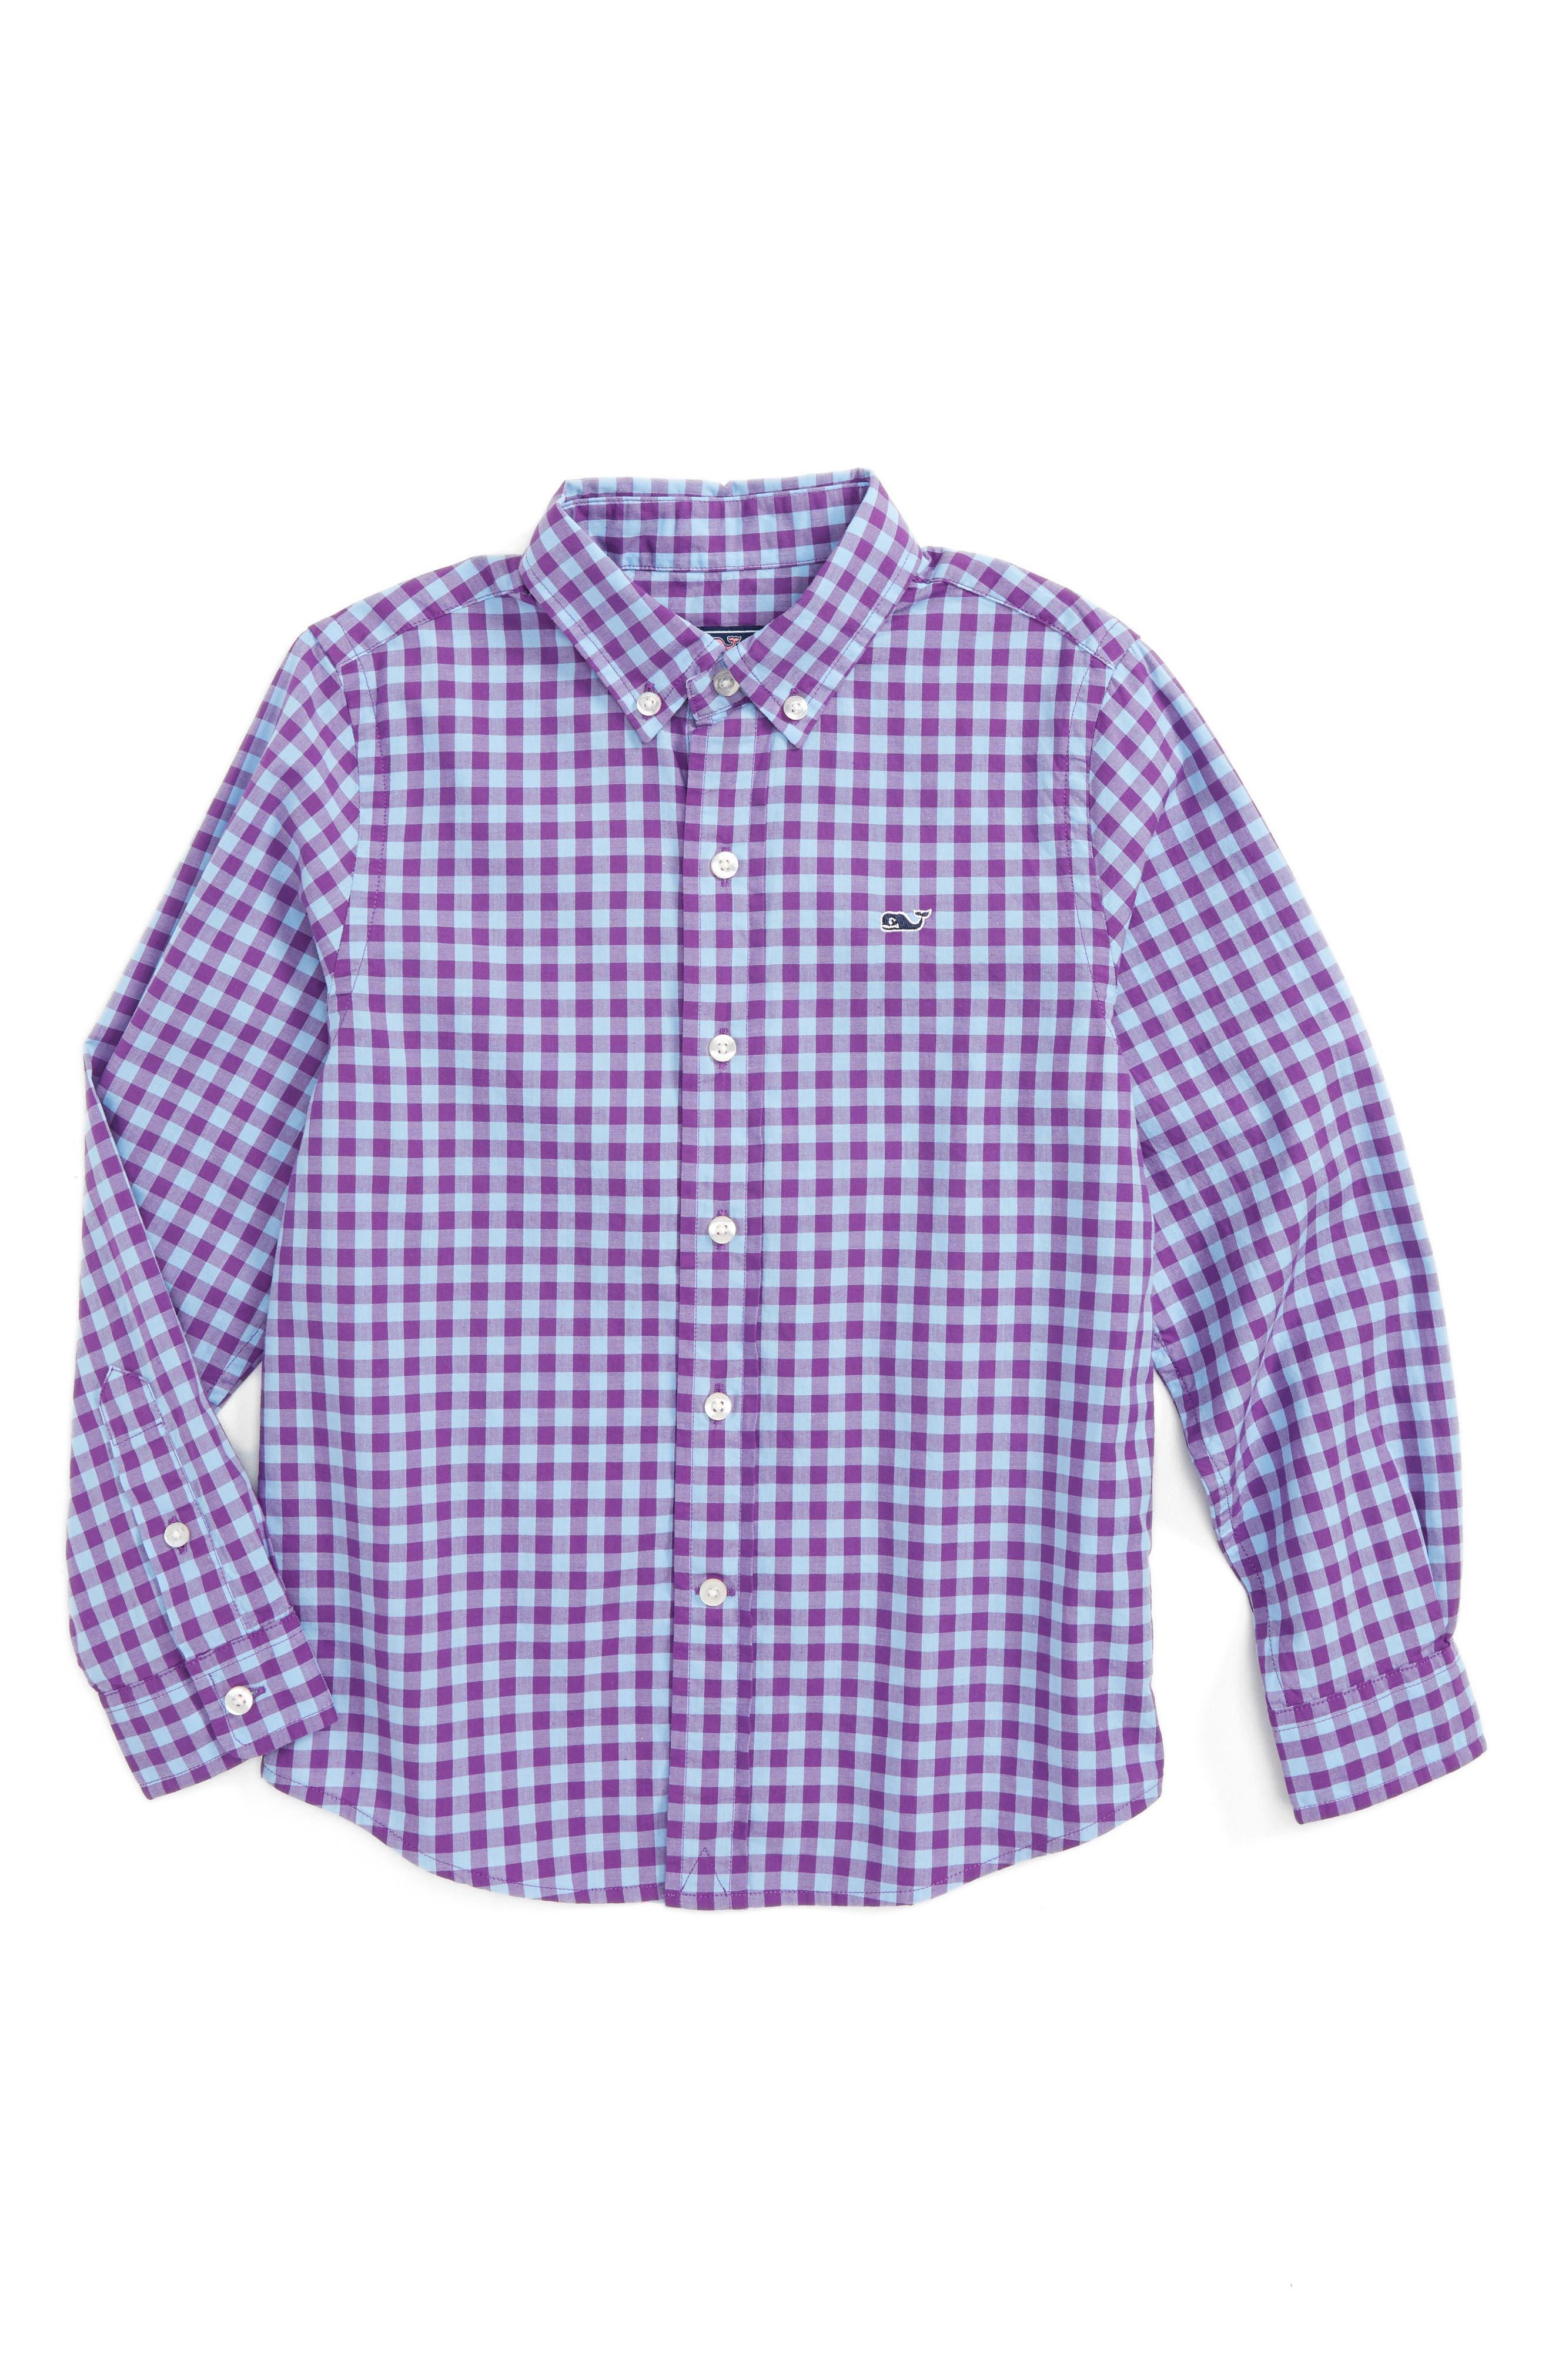 Foggy Quarter Gingham Whale Shirt,                             Main thumbnail 1, color,                             Snapdragon